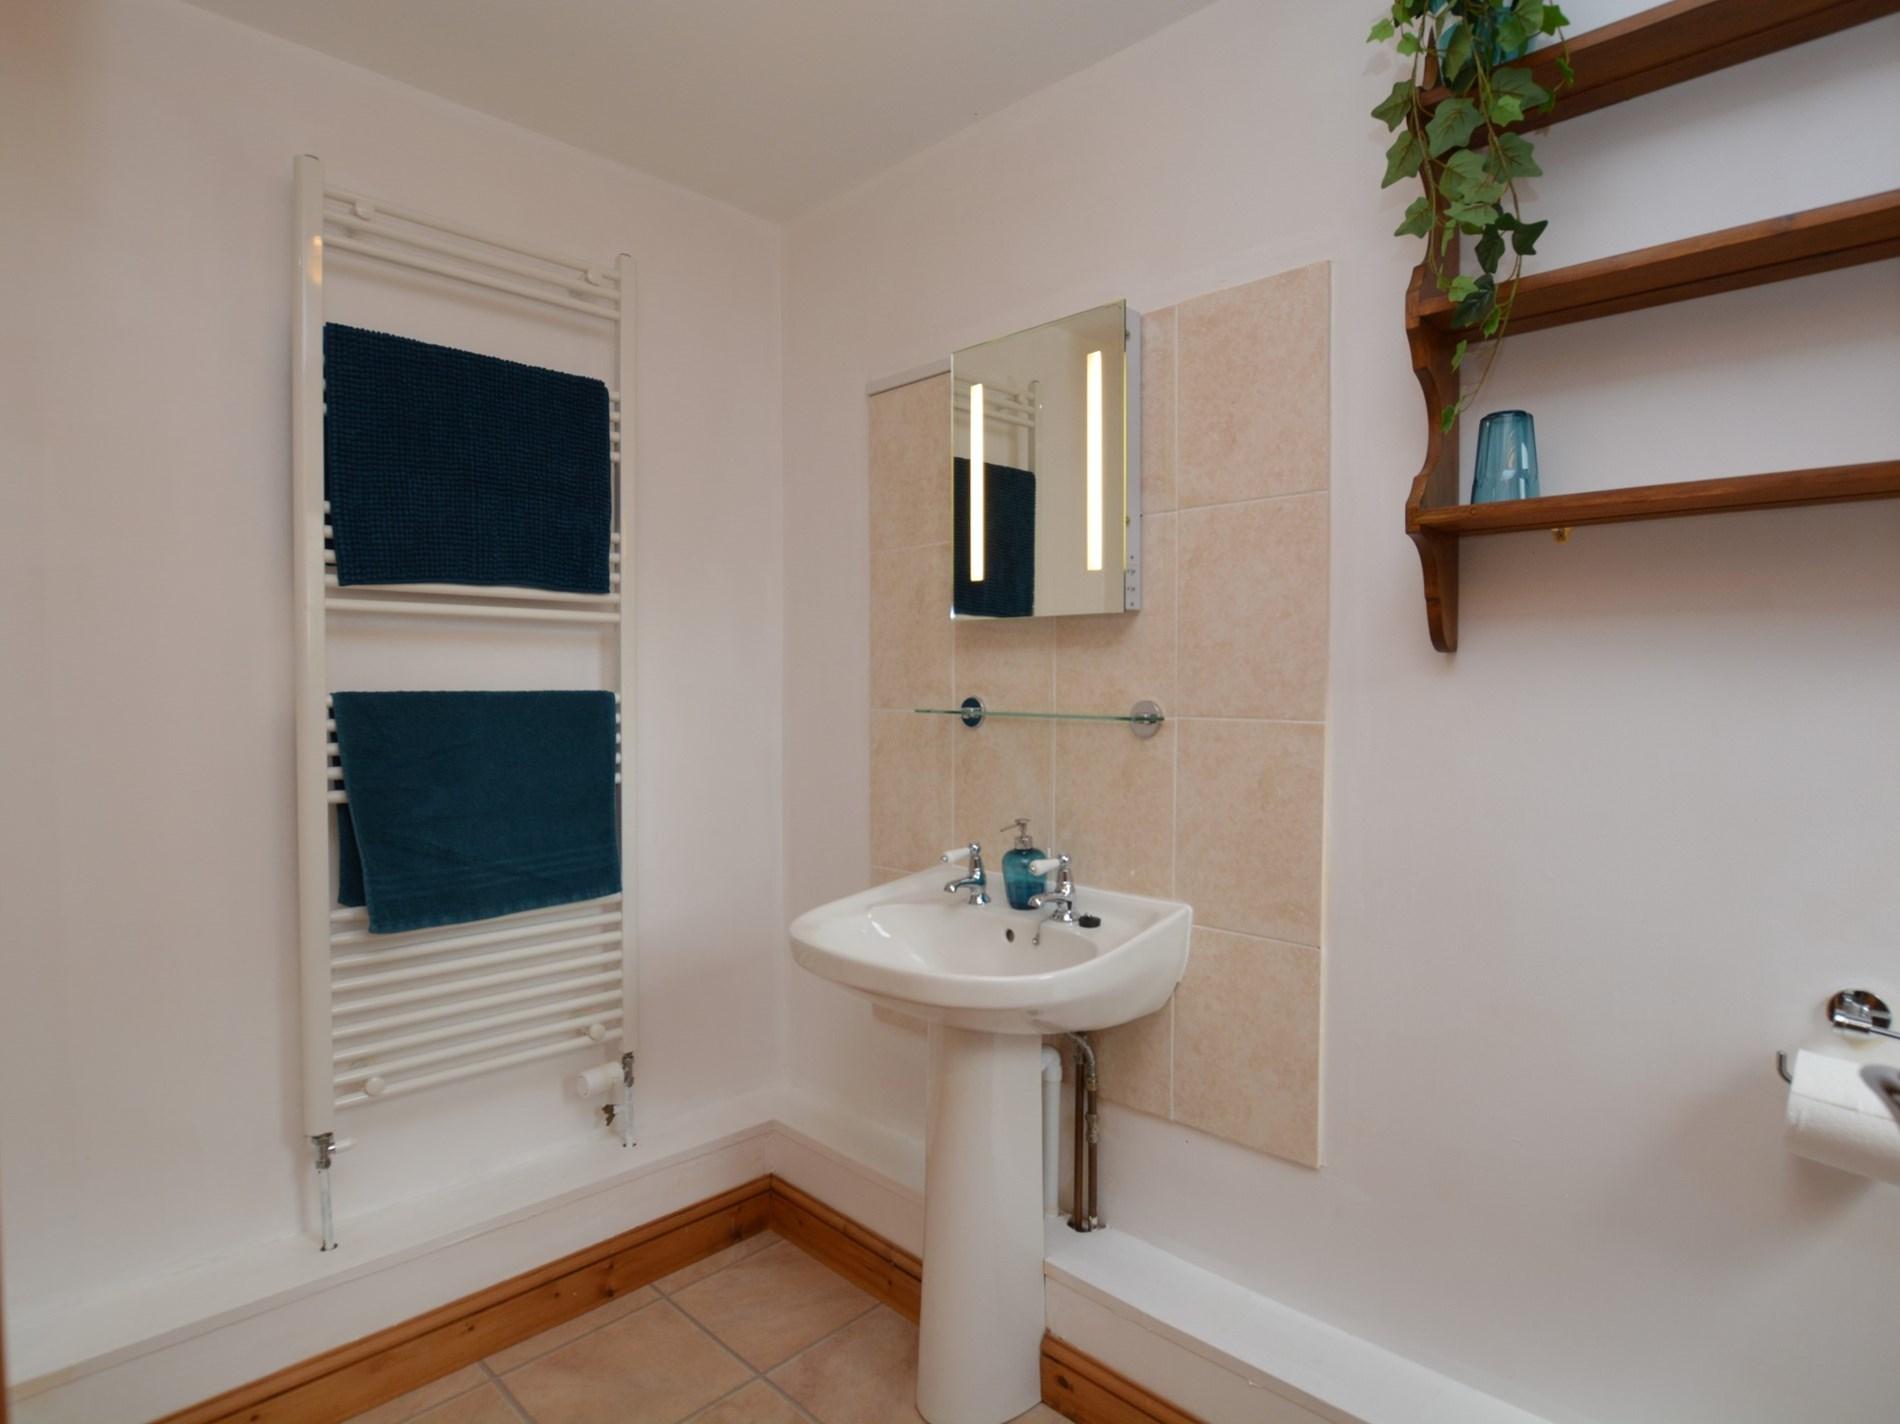 2 Bedroom Cottage in Sherborne, Dorset and Somerset